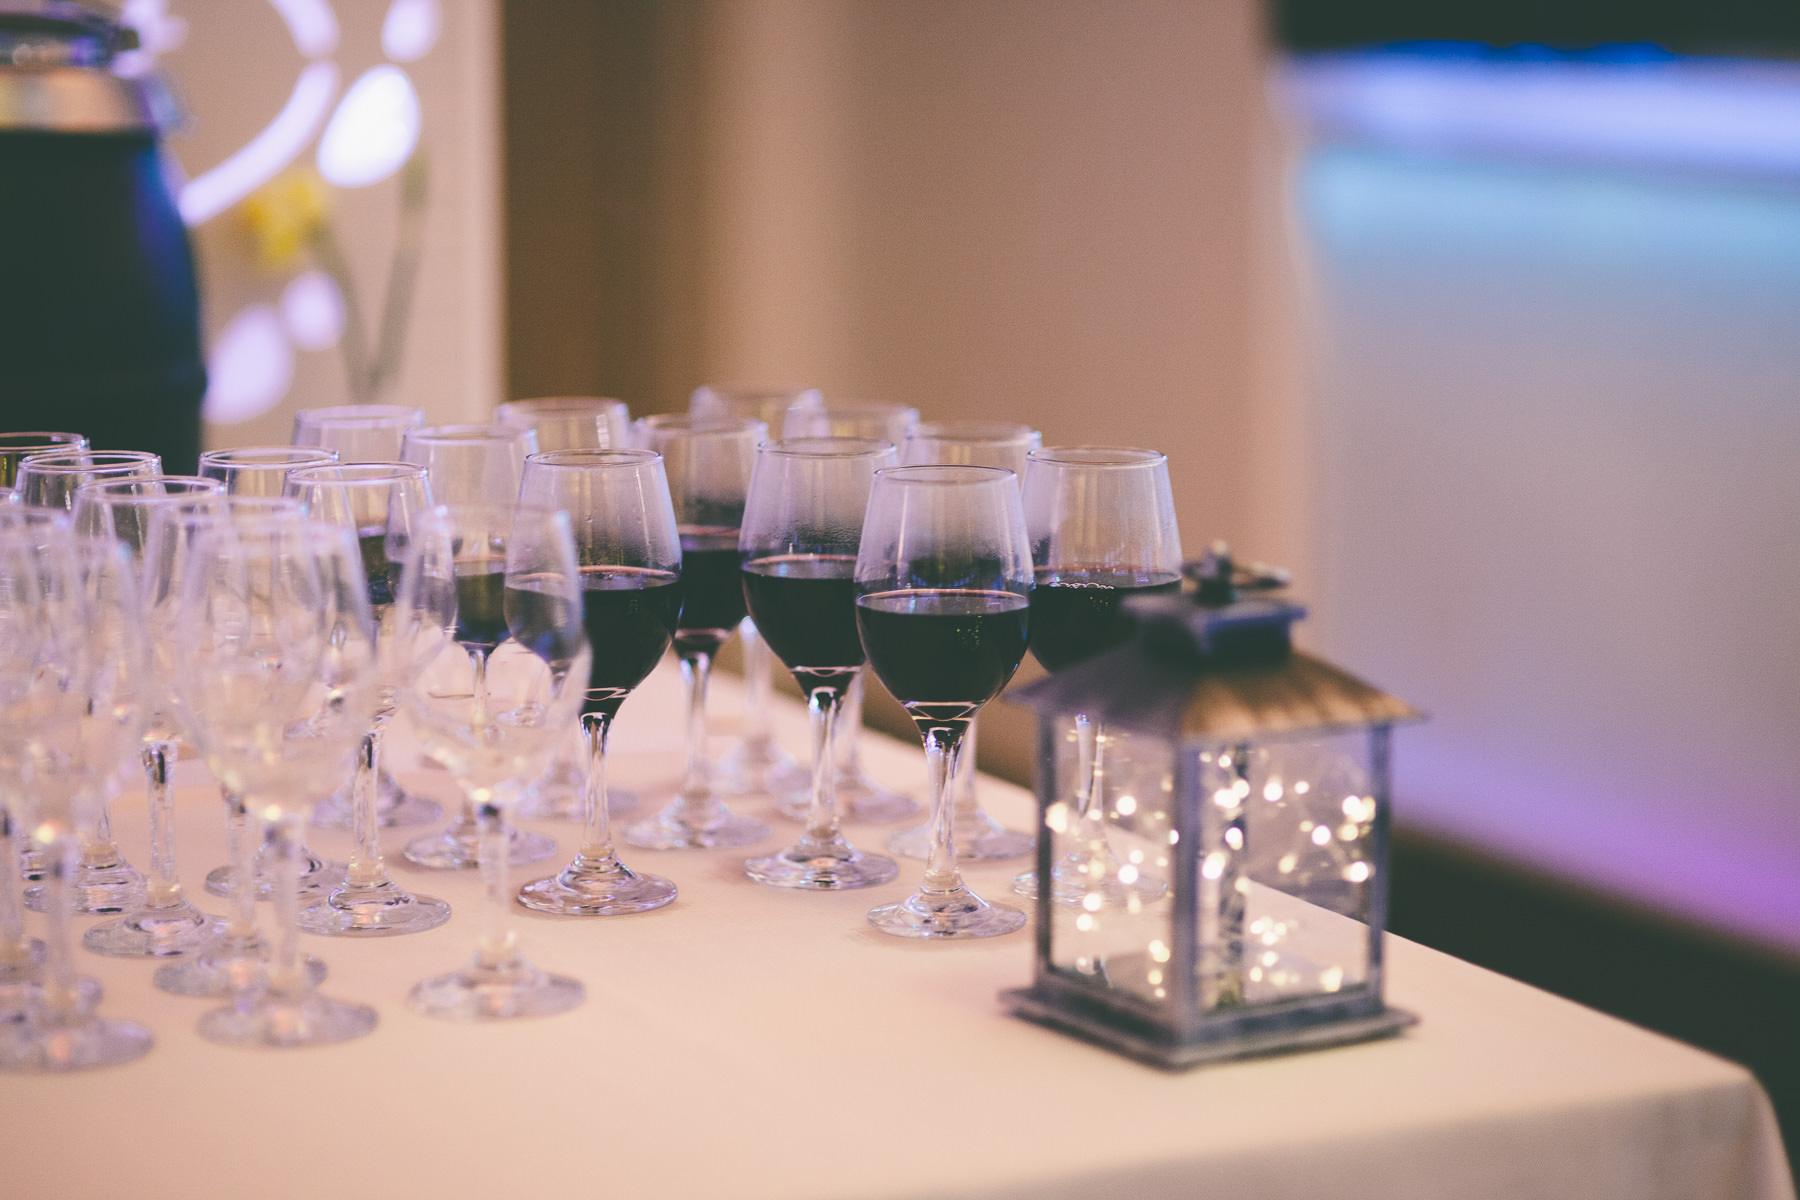 Titchfield-abbey-fareham-registry-wedding-photography-Jessica-and-Lance-web-210